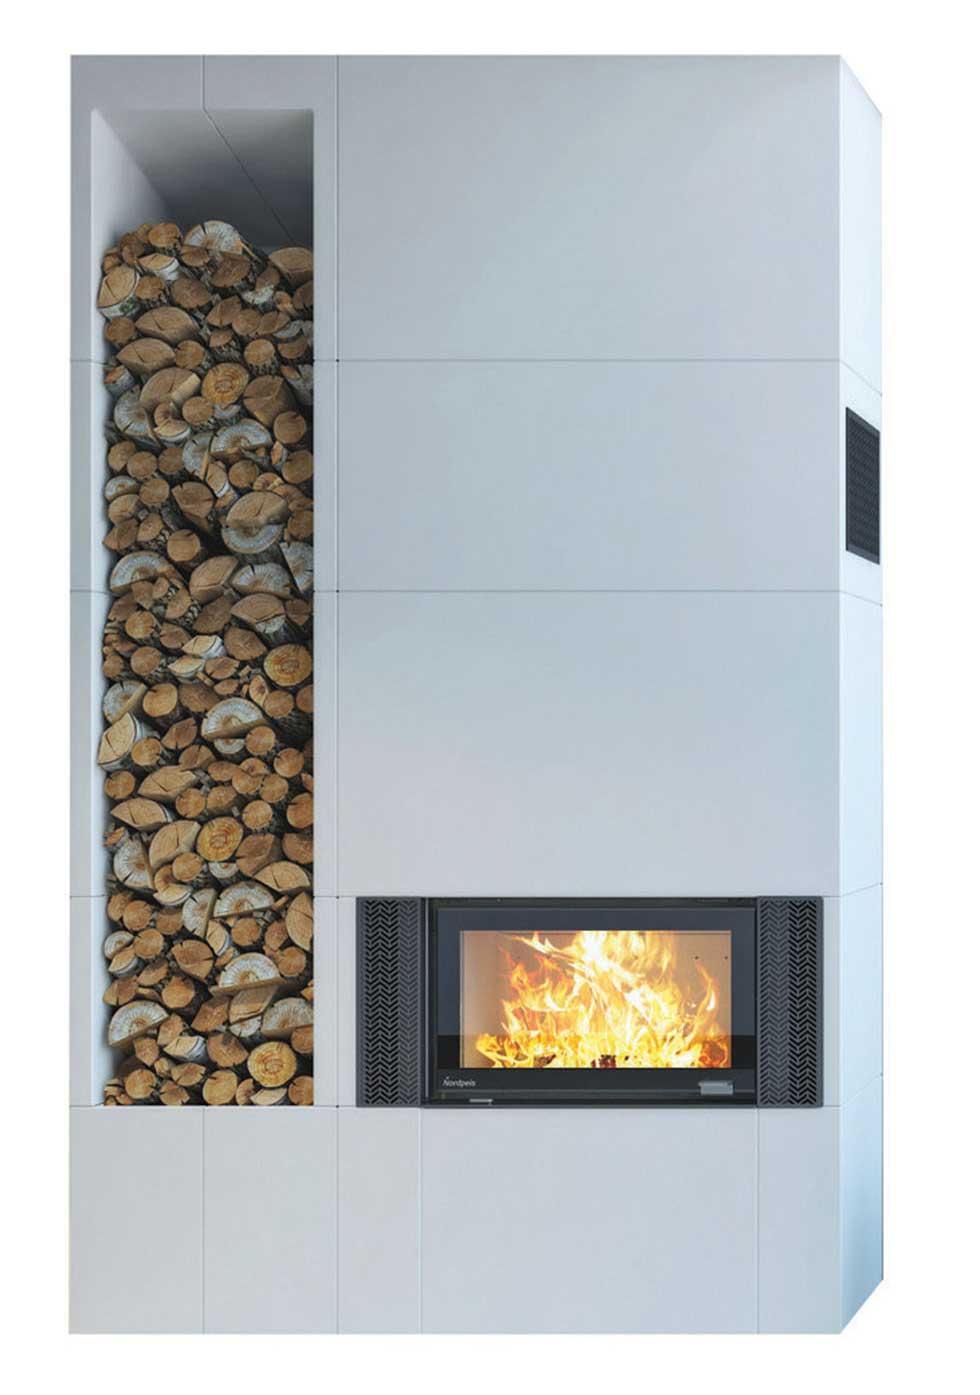 Choosing a Fire Surround  Homebuilding  Renovating